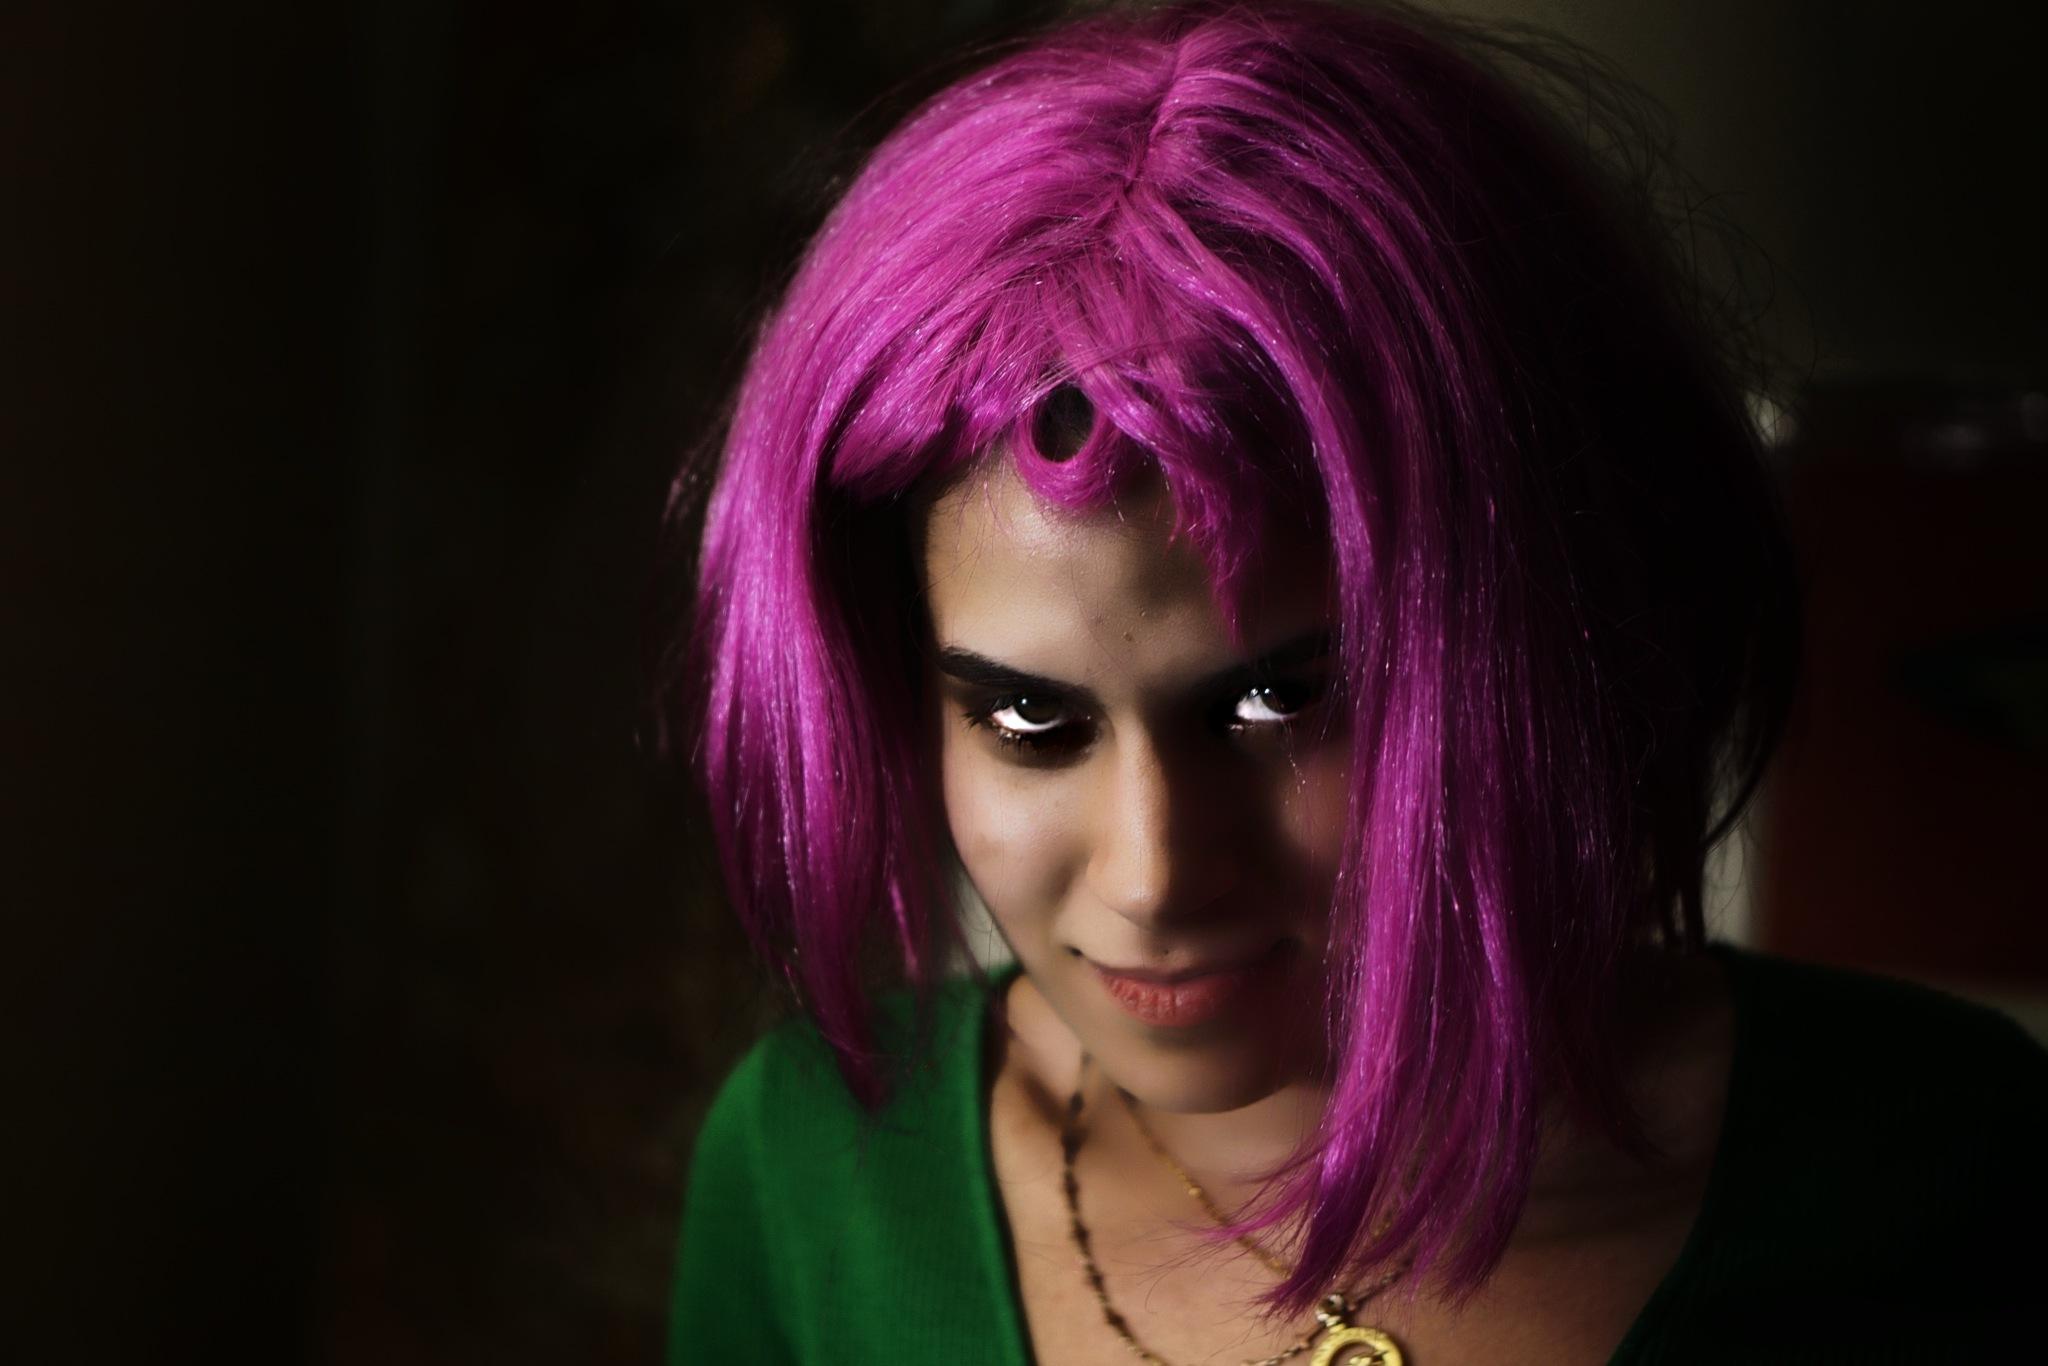 Evil Eyes by Kutlay Uyar